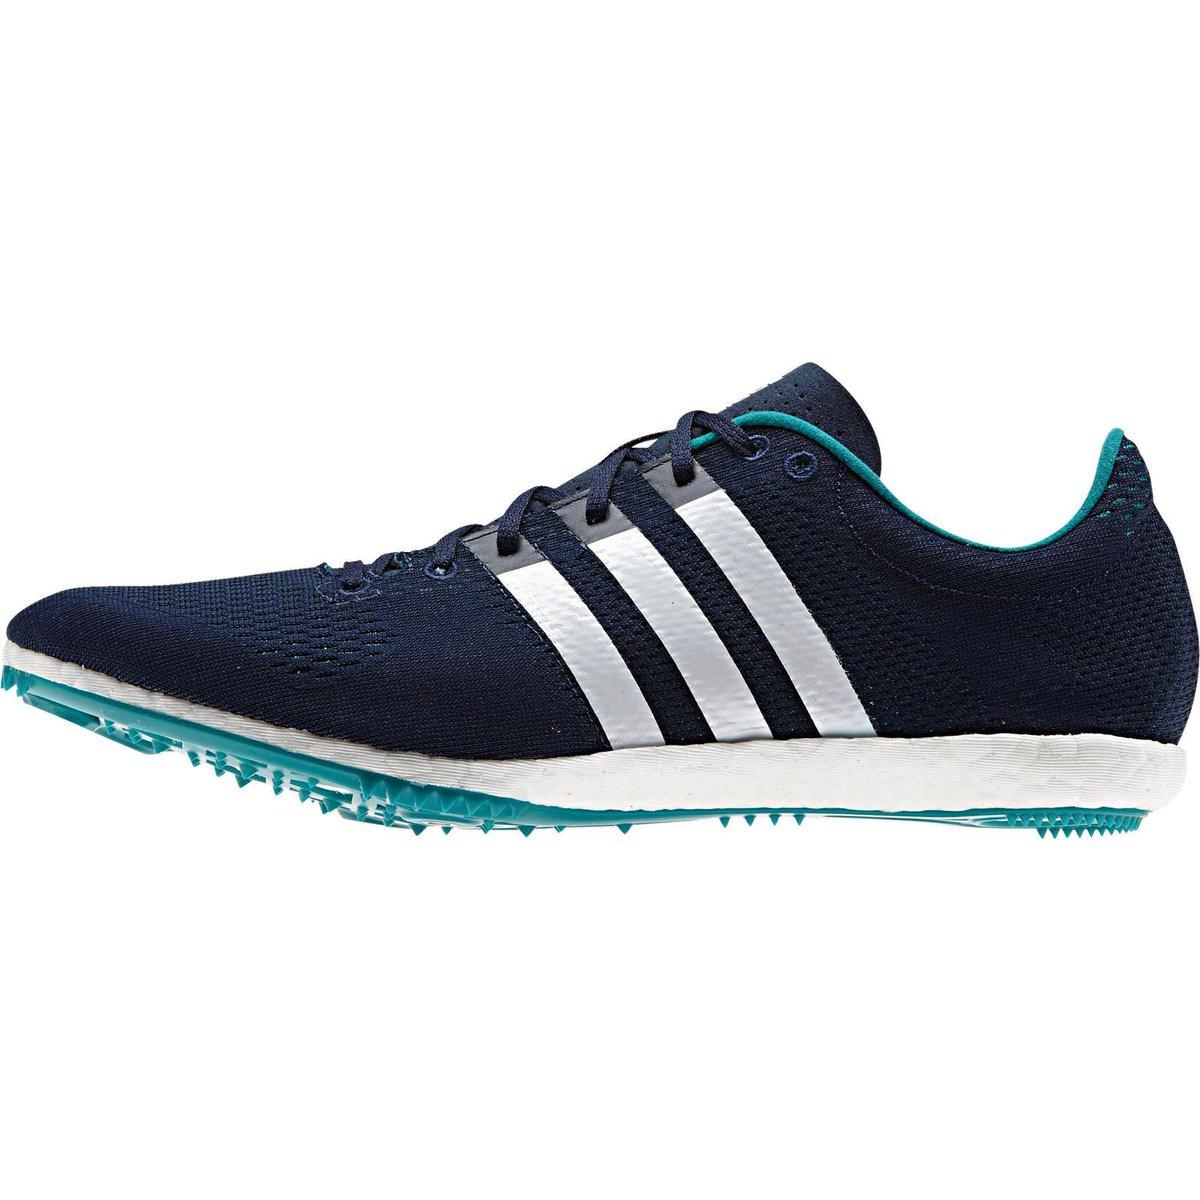 Adidas Adizero Avanti Boost Spikes